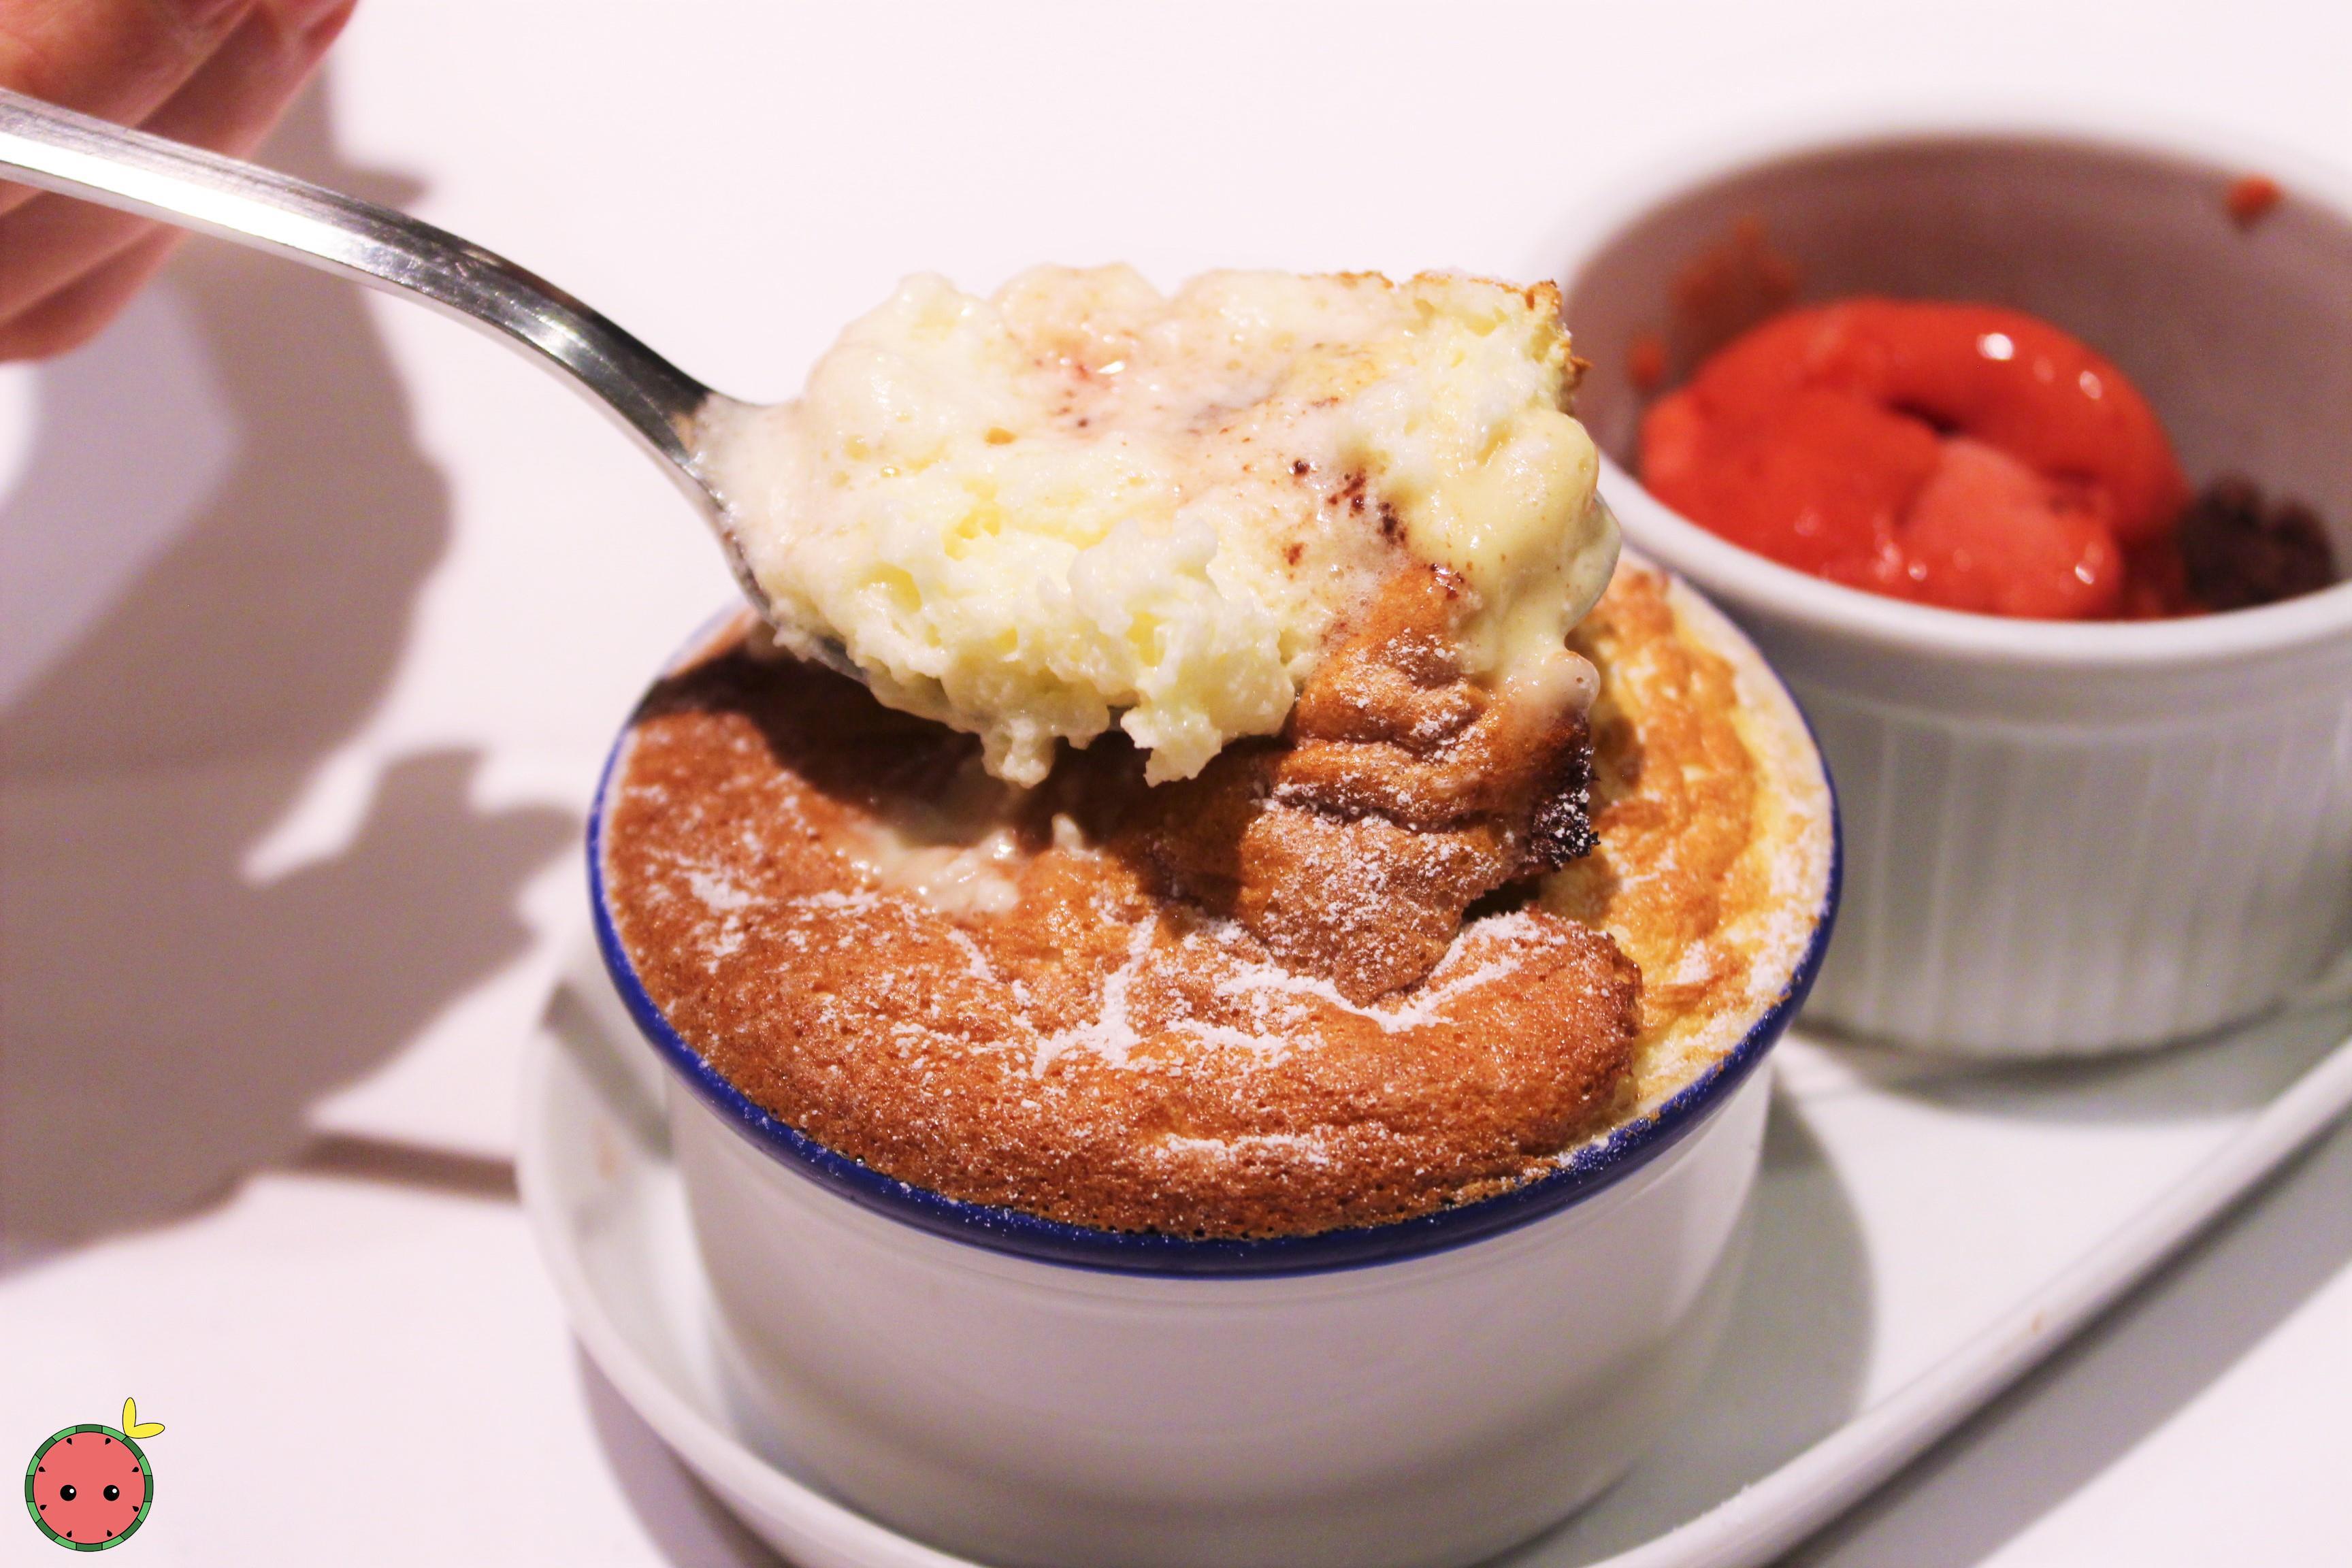 Cream_cheese_soufflé_with_raspberry_ice_cream_(3)